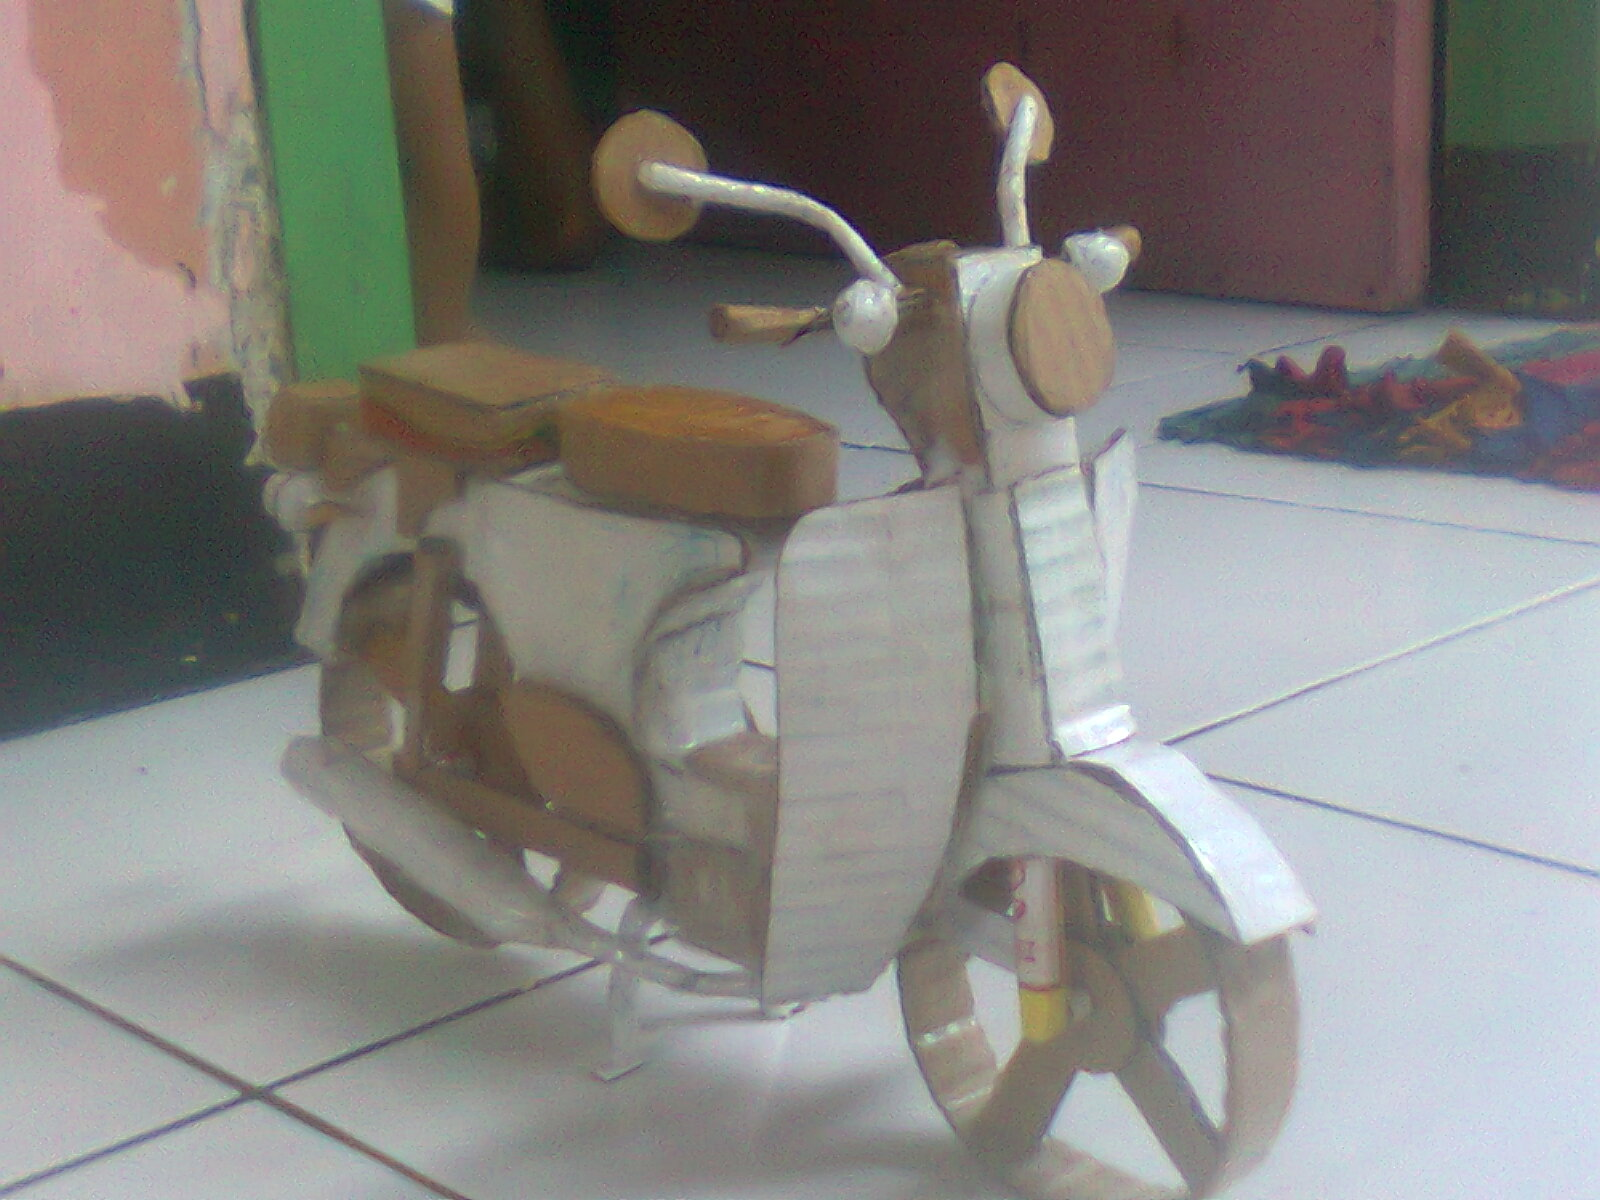 Jual Miniatur Vespa Bambu Kab Banyumas Maz Alim Tokopedia